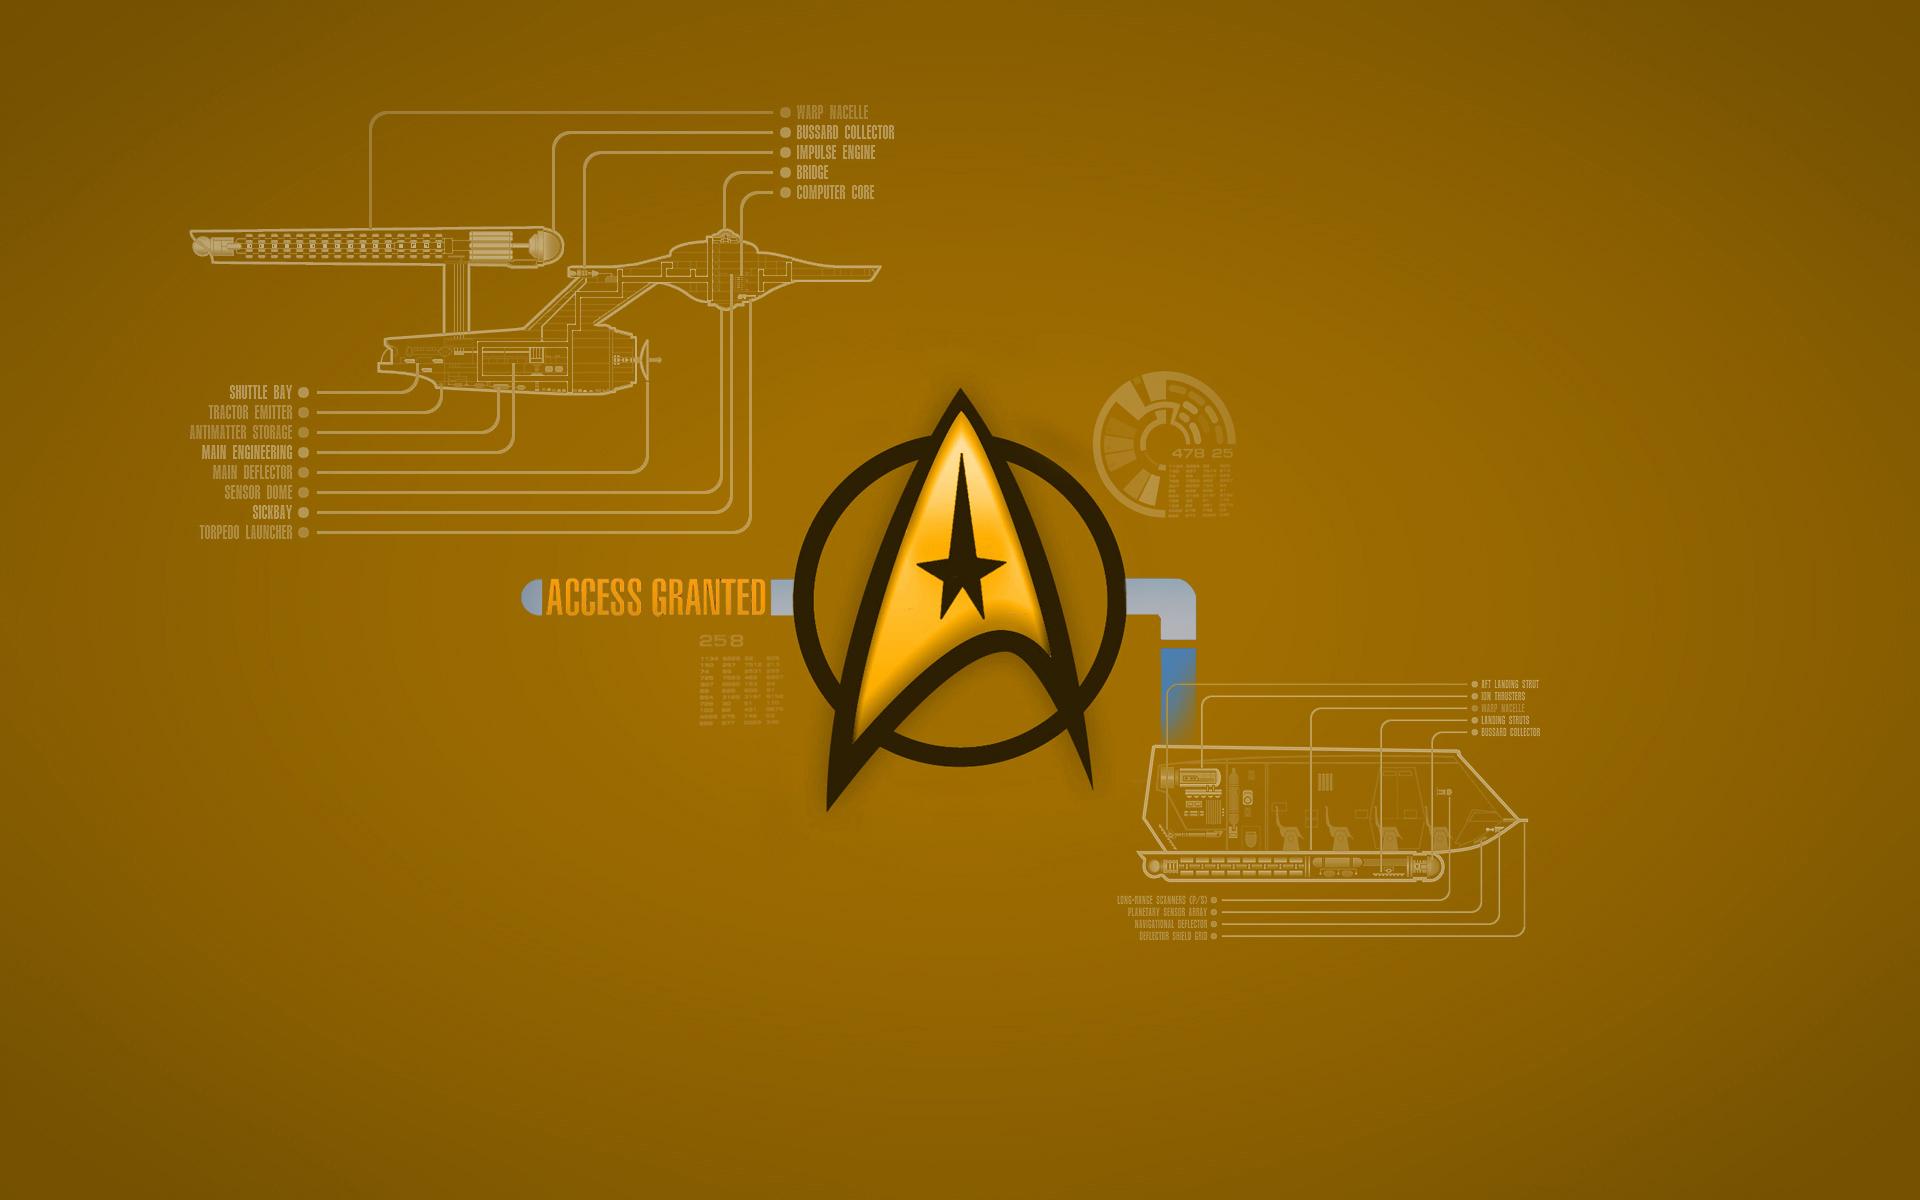 star trek starfleet command wallpaper - photo #20